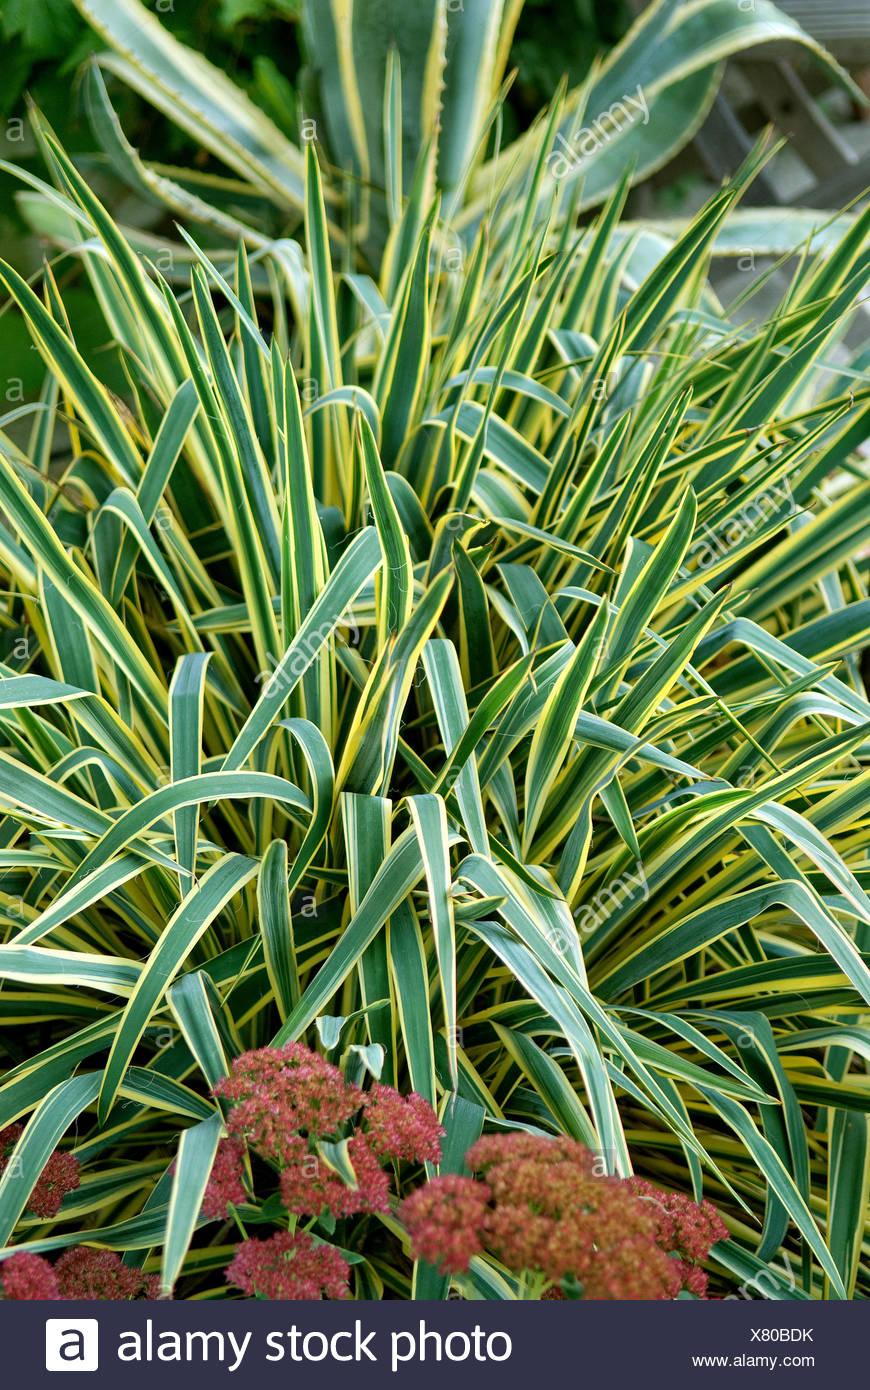 Aiguille d'Adam, la faiblesse des feuilles du yucca (Yucca filamentosa 'Bright Edge', Yucca filamentosa Bright Edge), le cultivar bord lumineux Photo Stock